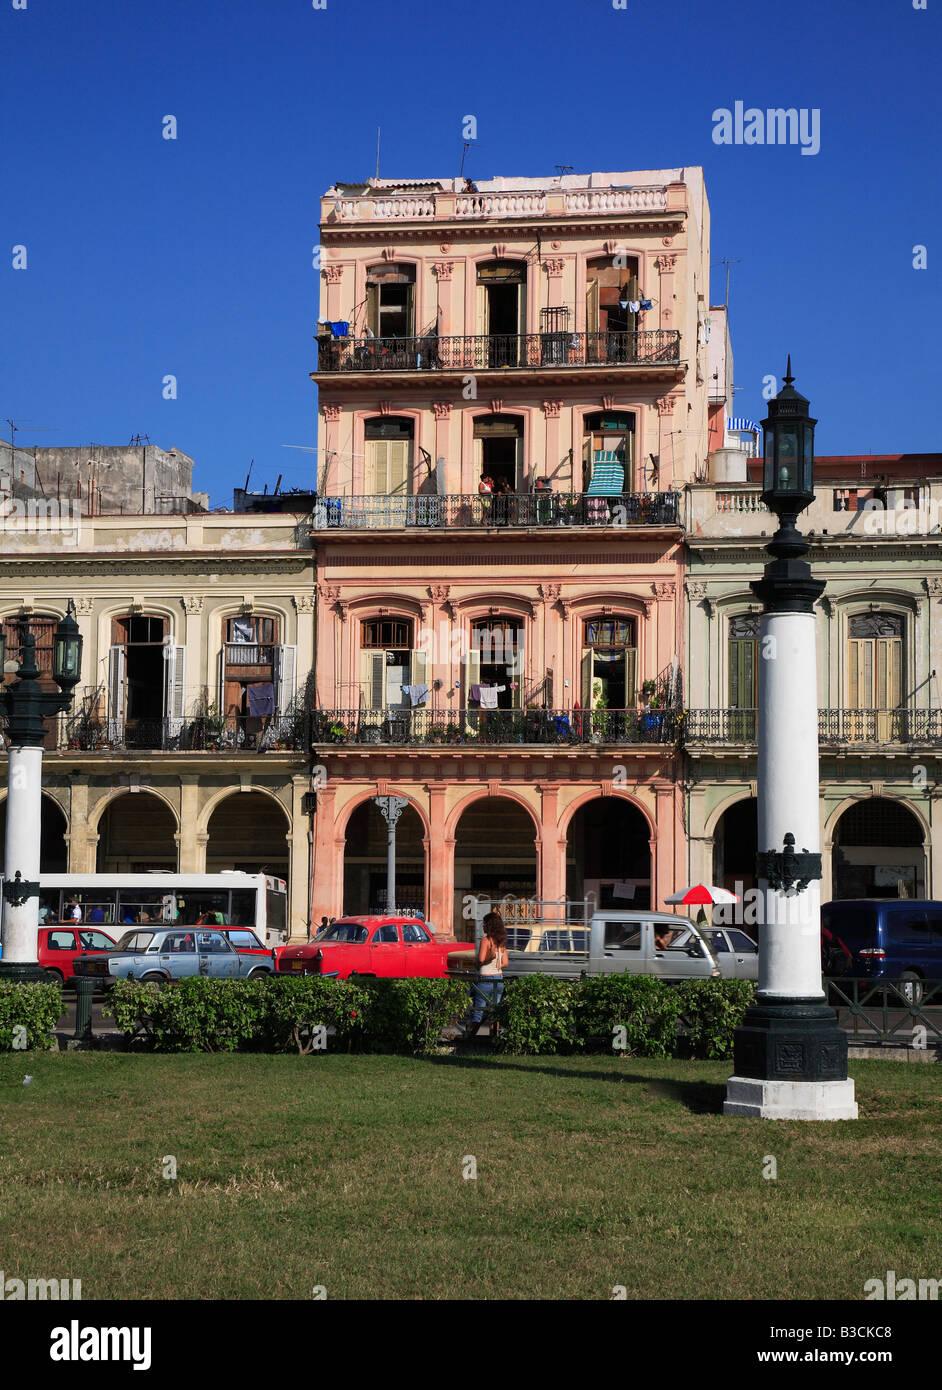 Parque Central am Boulevard Paseo de Marti in der Nähe der Hauptstadt Havanna Havanna Habana Kuba Stockbild